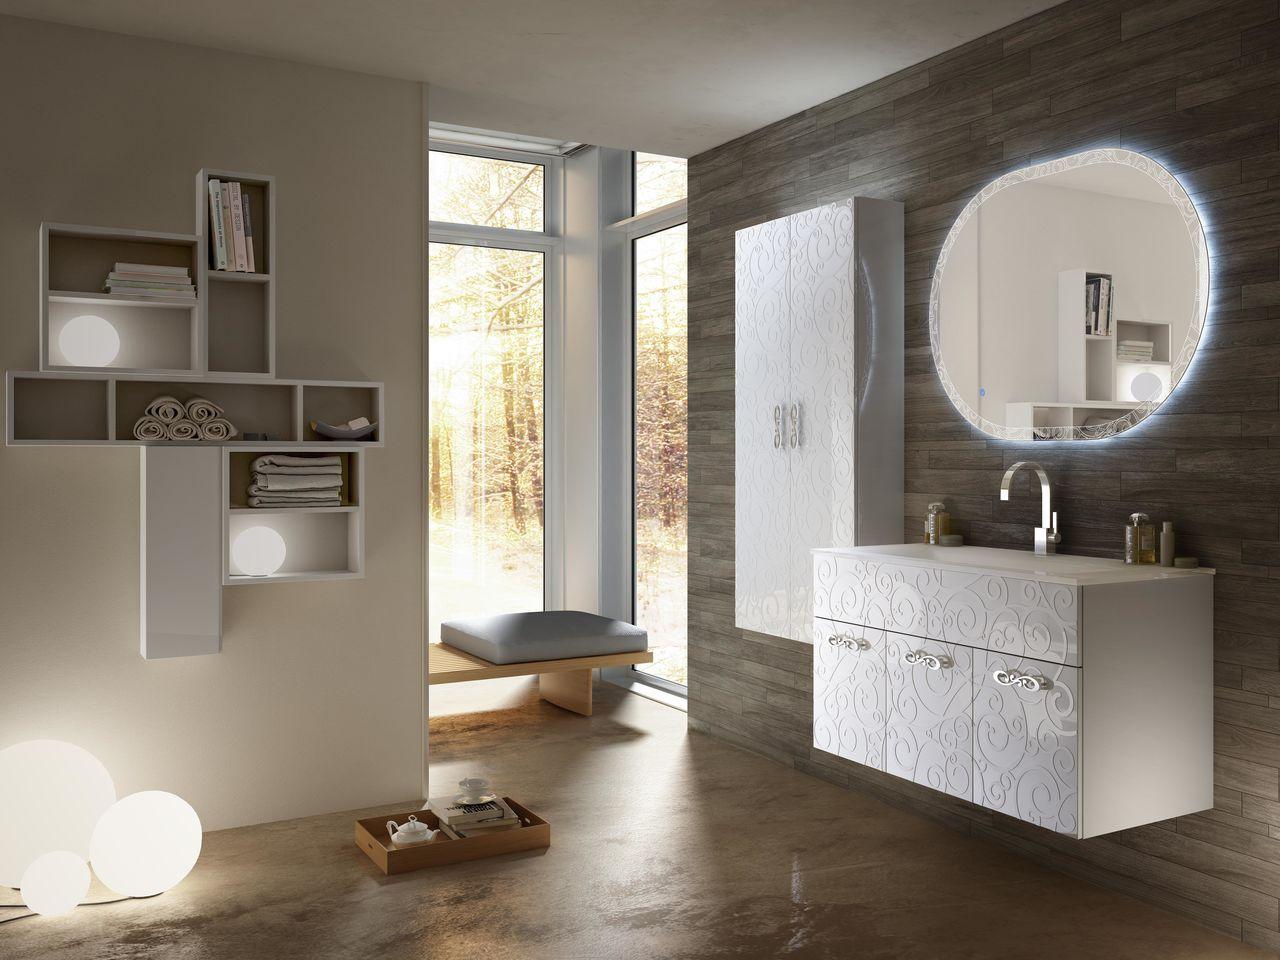 MIAMI - Sapphire Bath | Lighted bathroom mirror, Dream ...